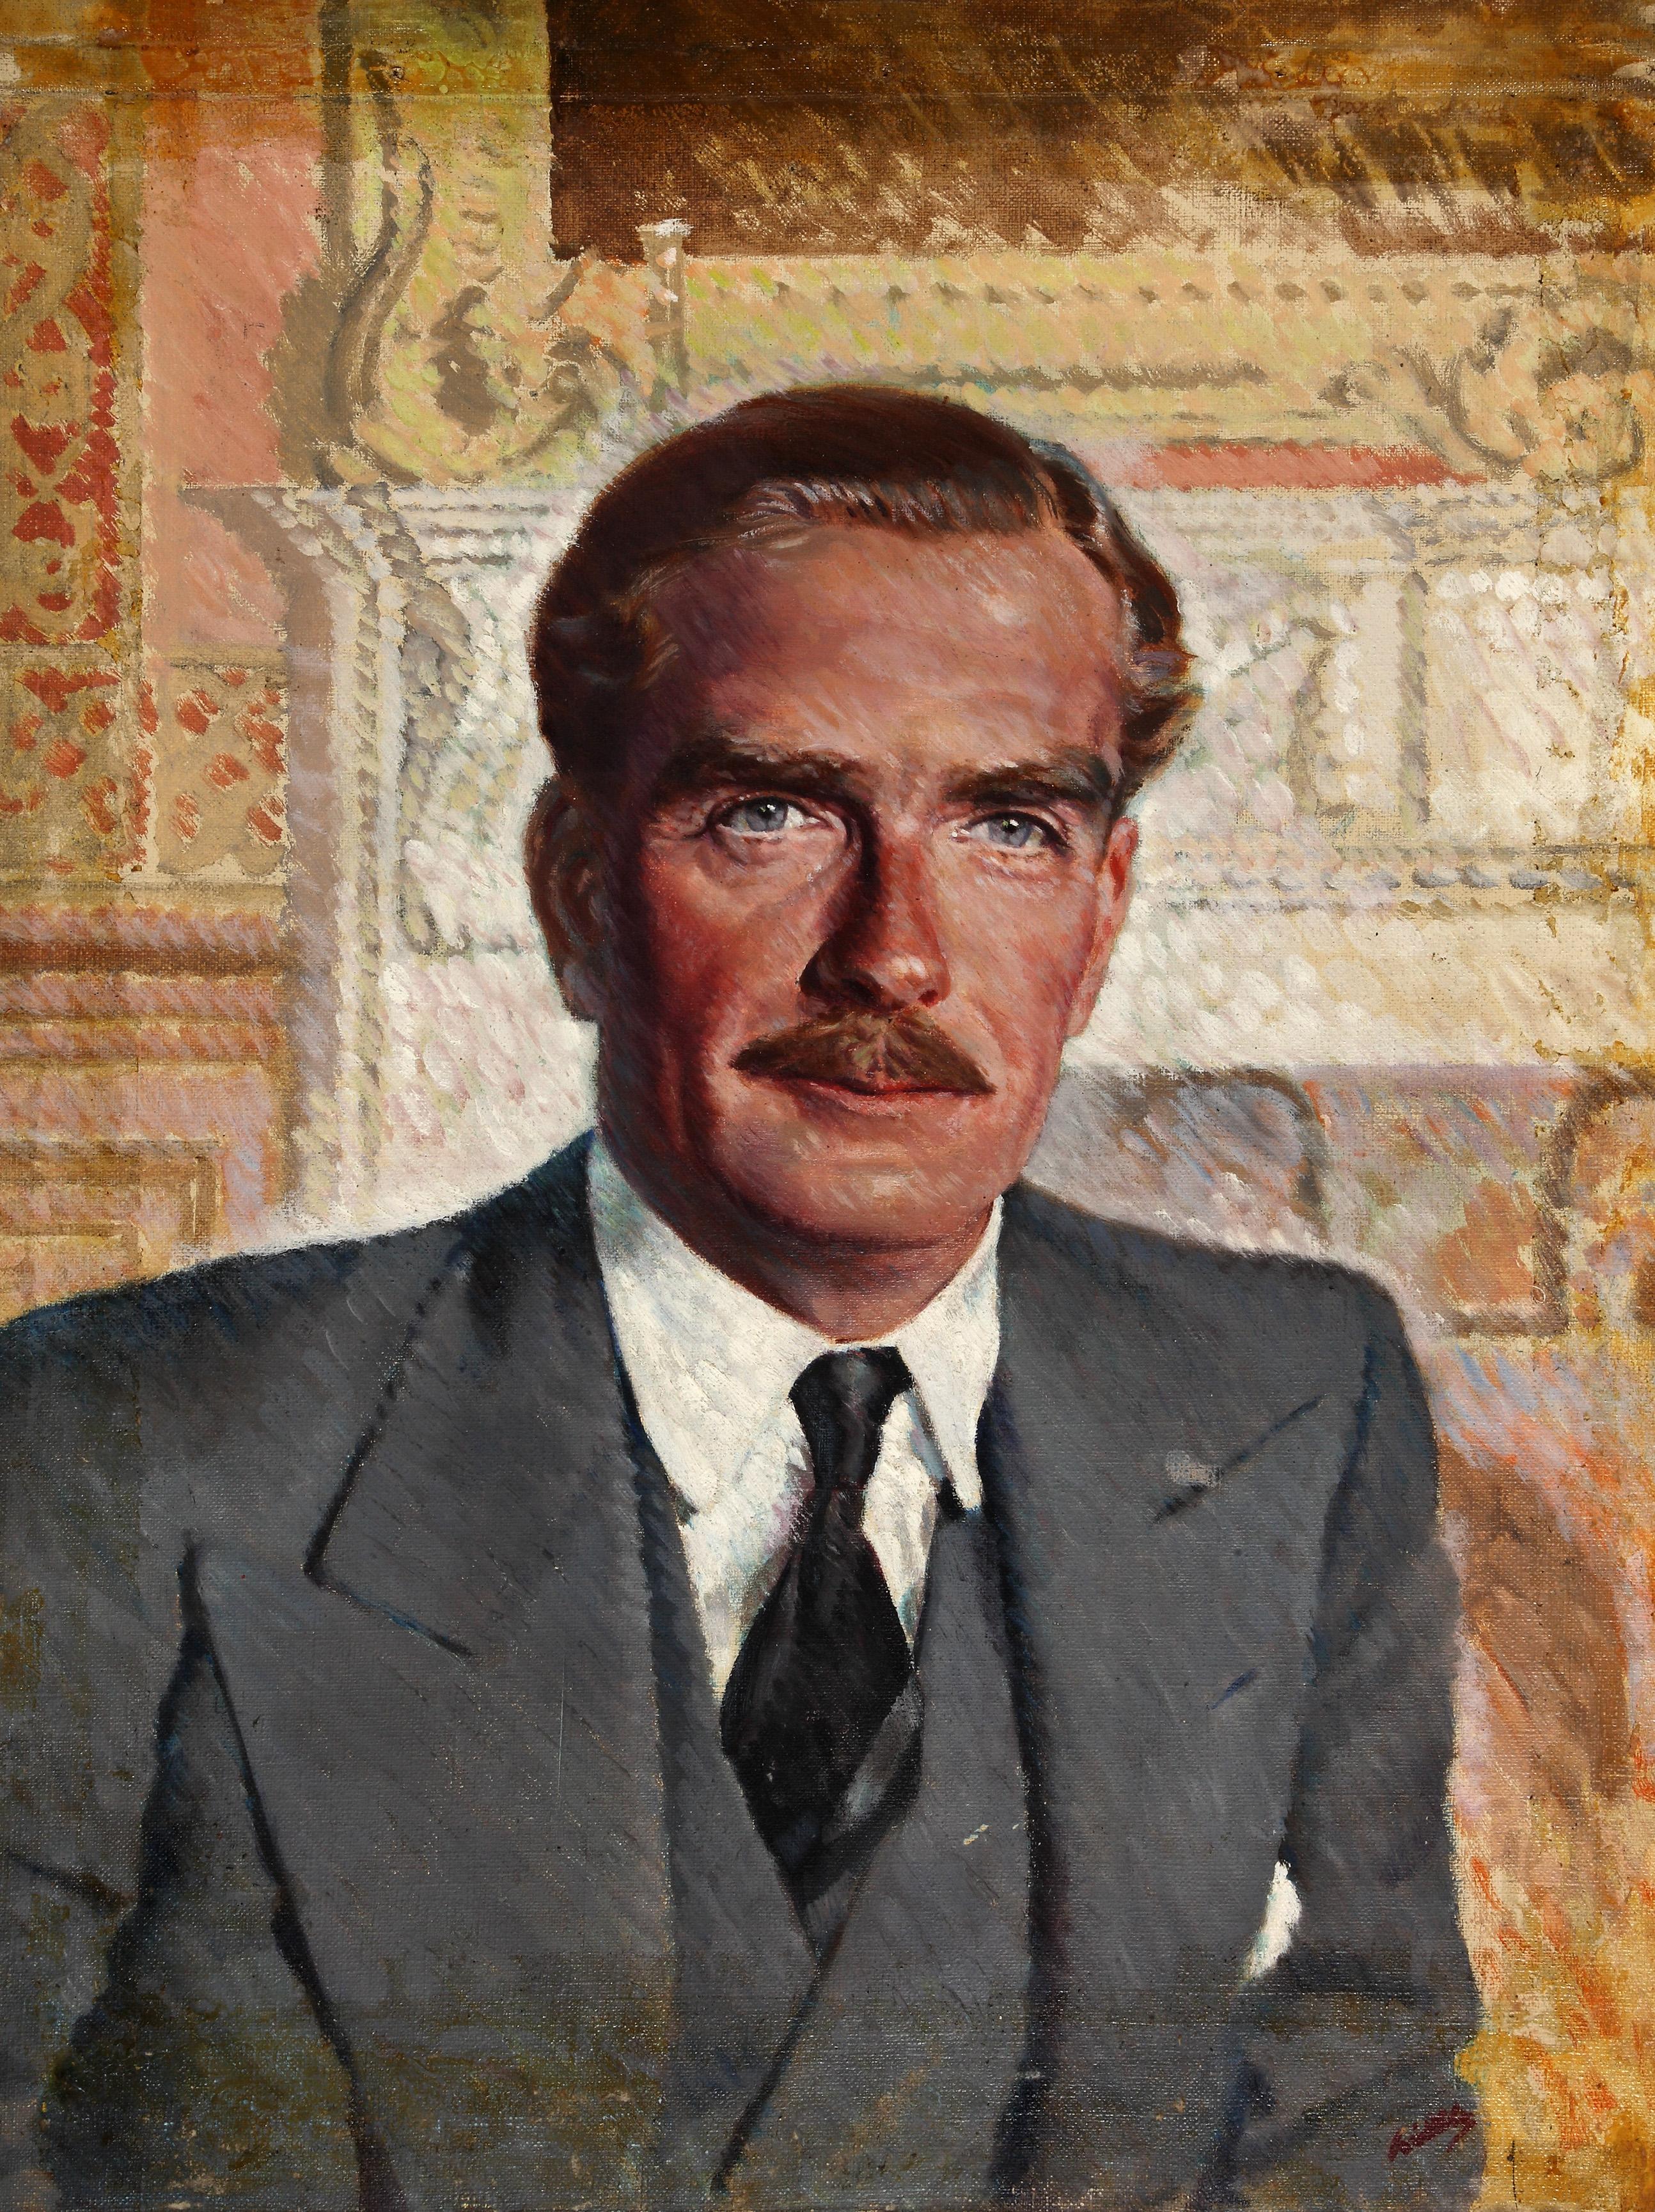 Britannique rencontres Guy conseils Milton Keynes Agence de rencontres